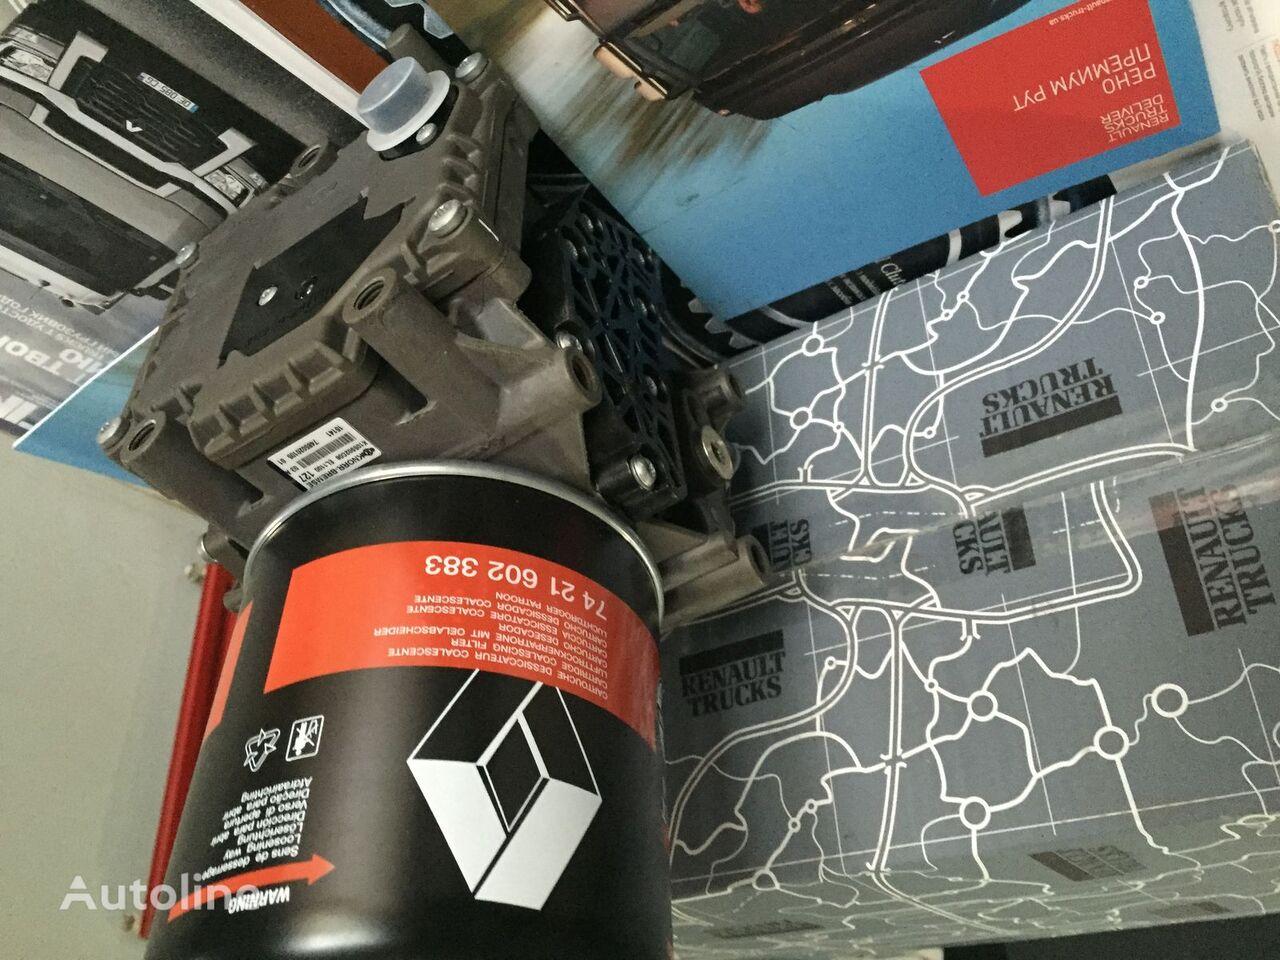 new RENAULT Pnevmaticheskiy ARM (7422277957) pneumatic crane for RENAULT Premium DXI, Kerax DXI,Magnum DXI , Midlum DXI truck